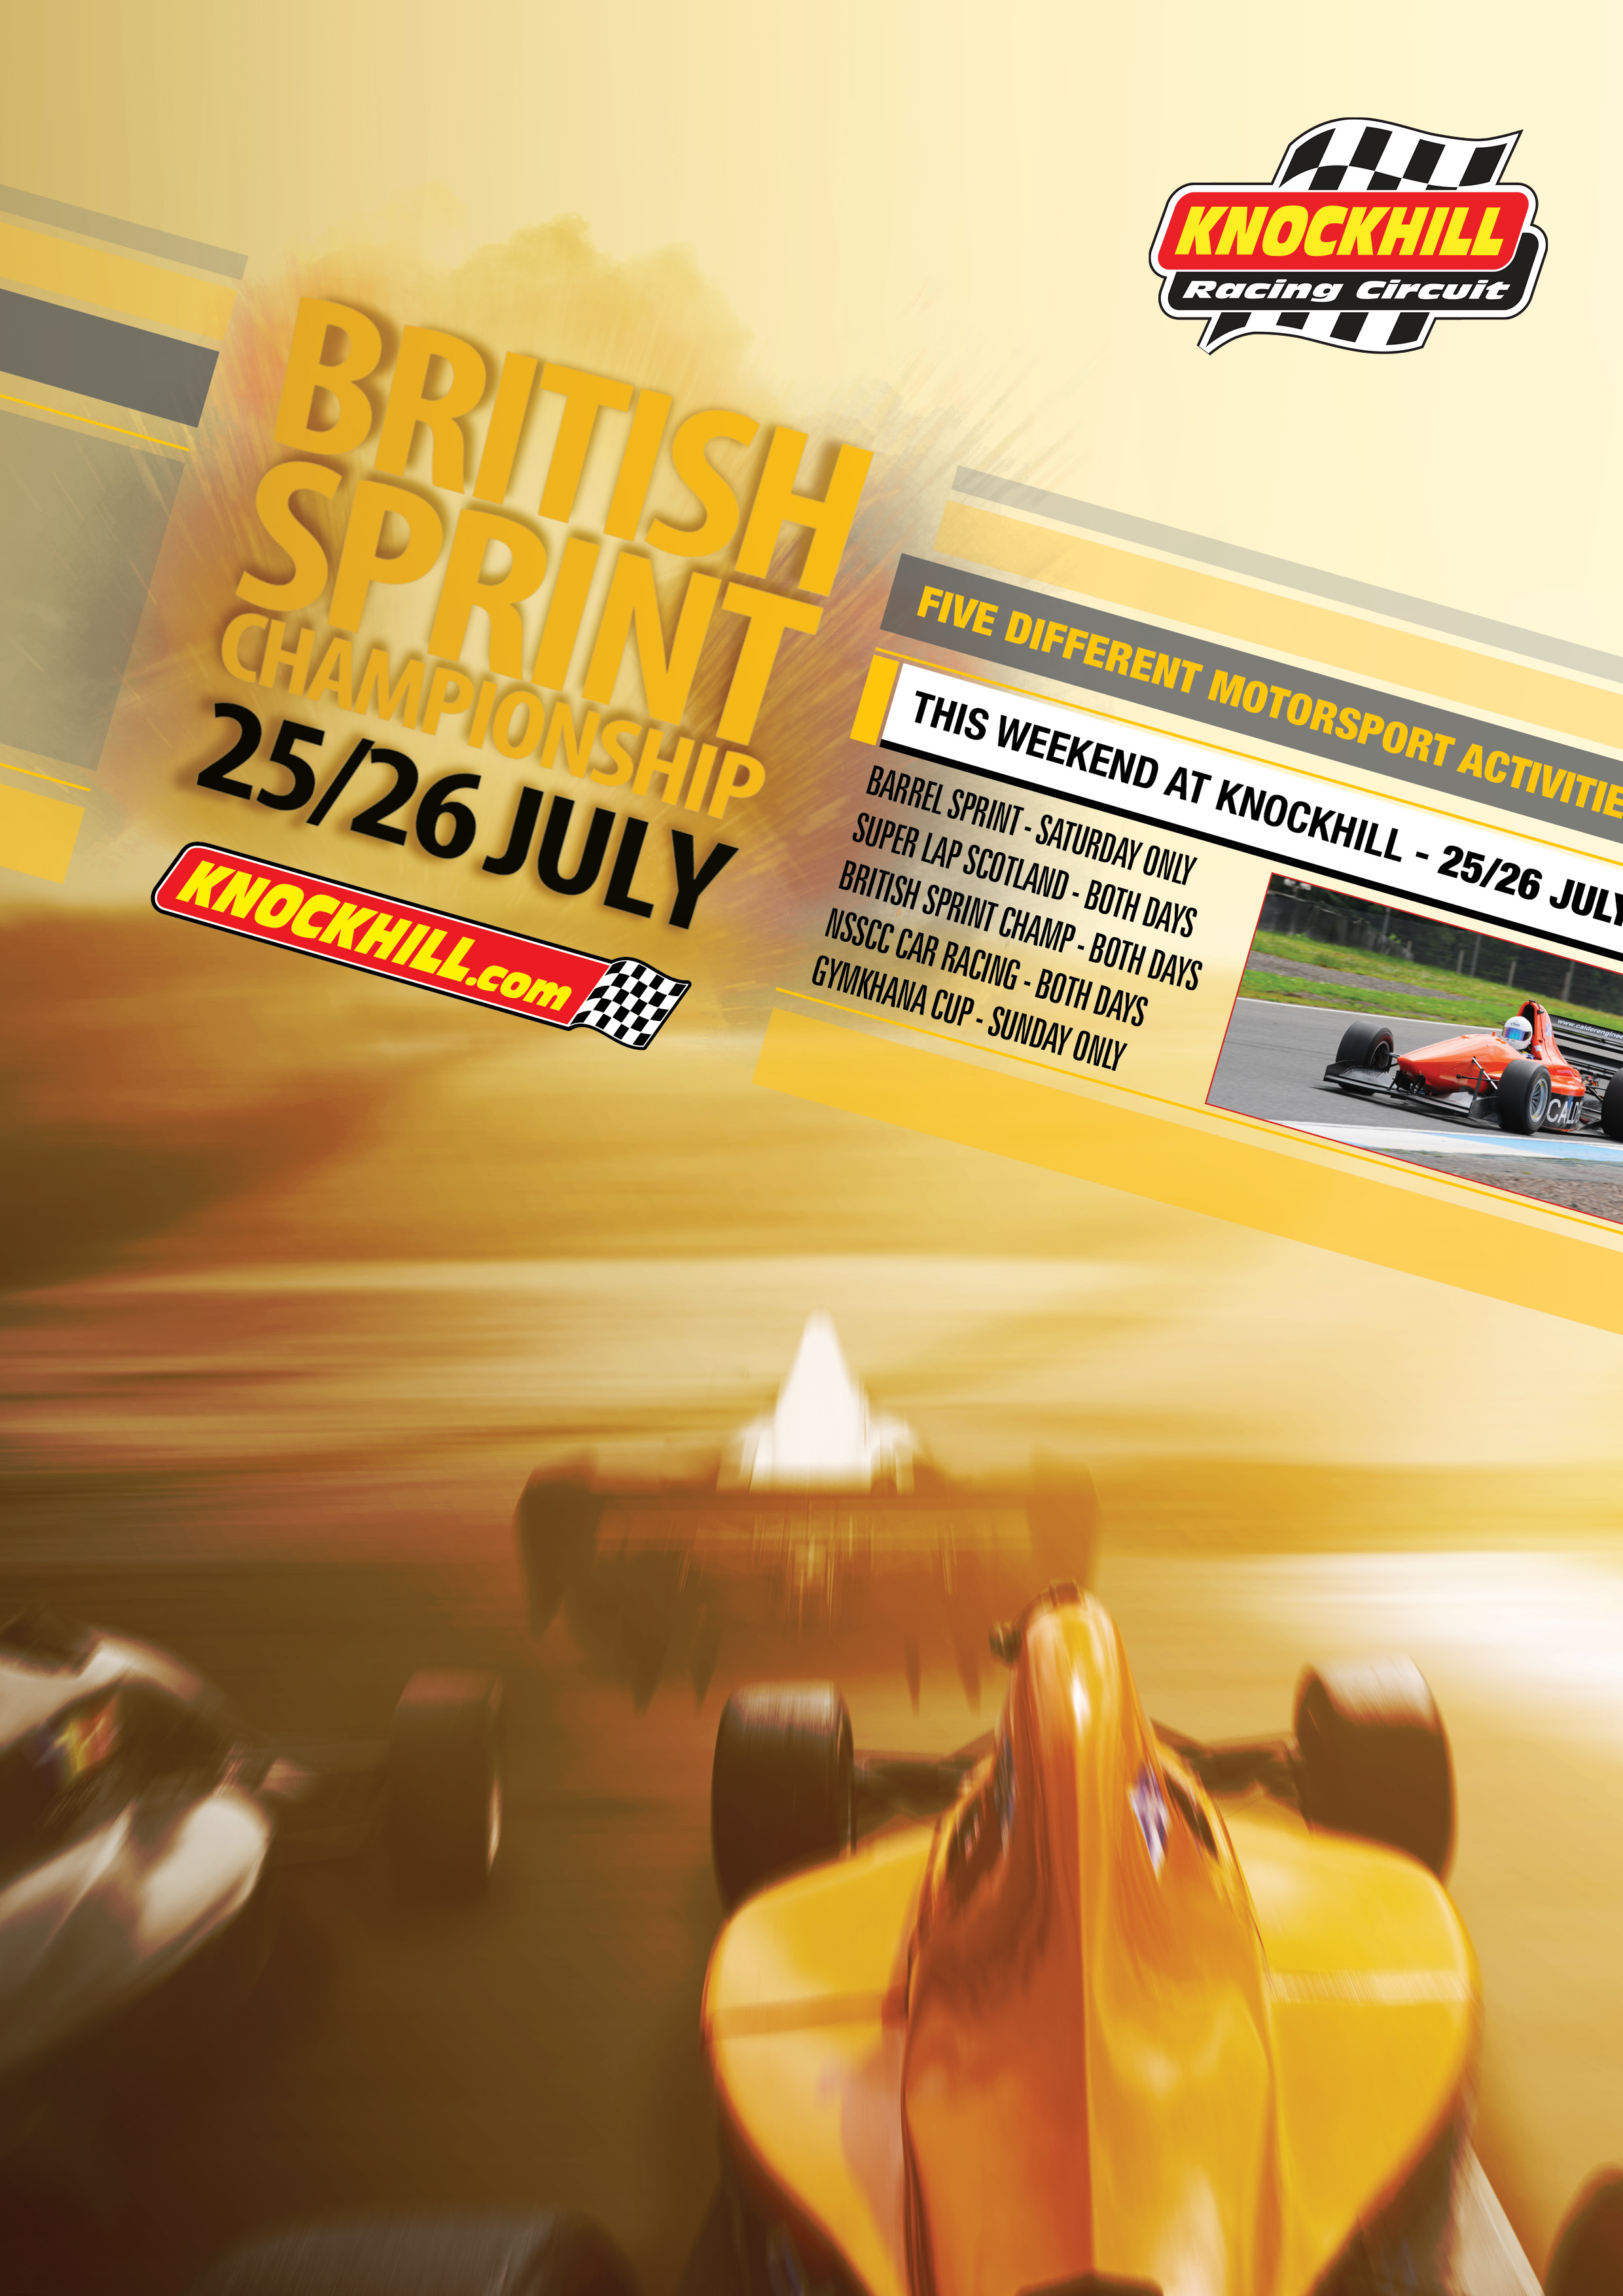 BritishSprint_poster